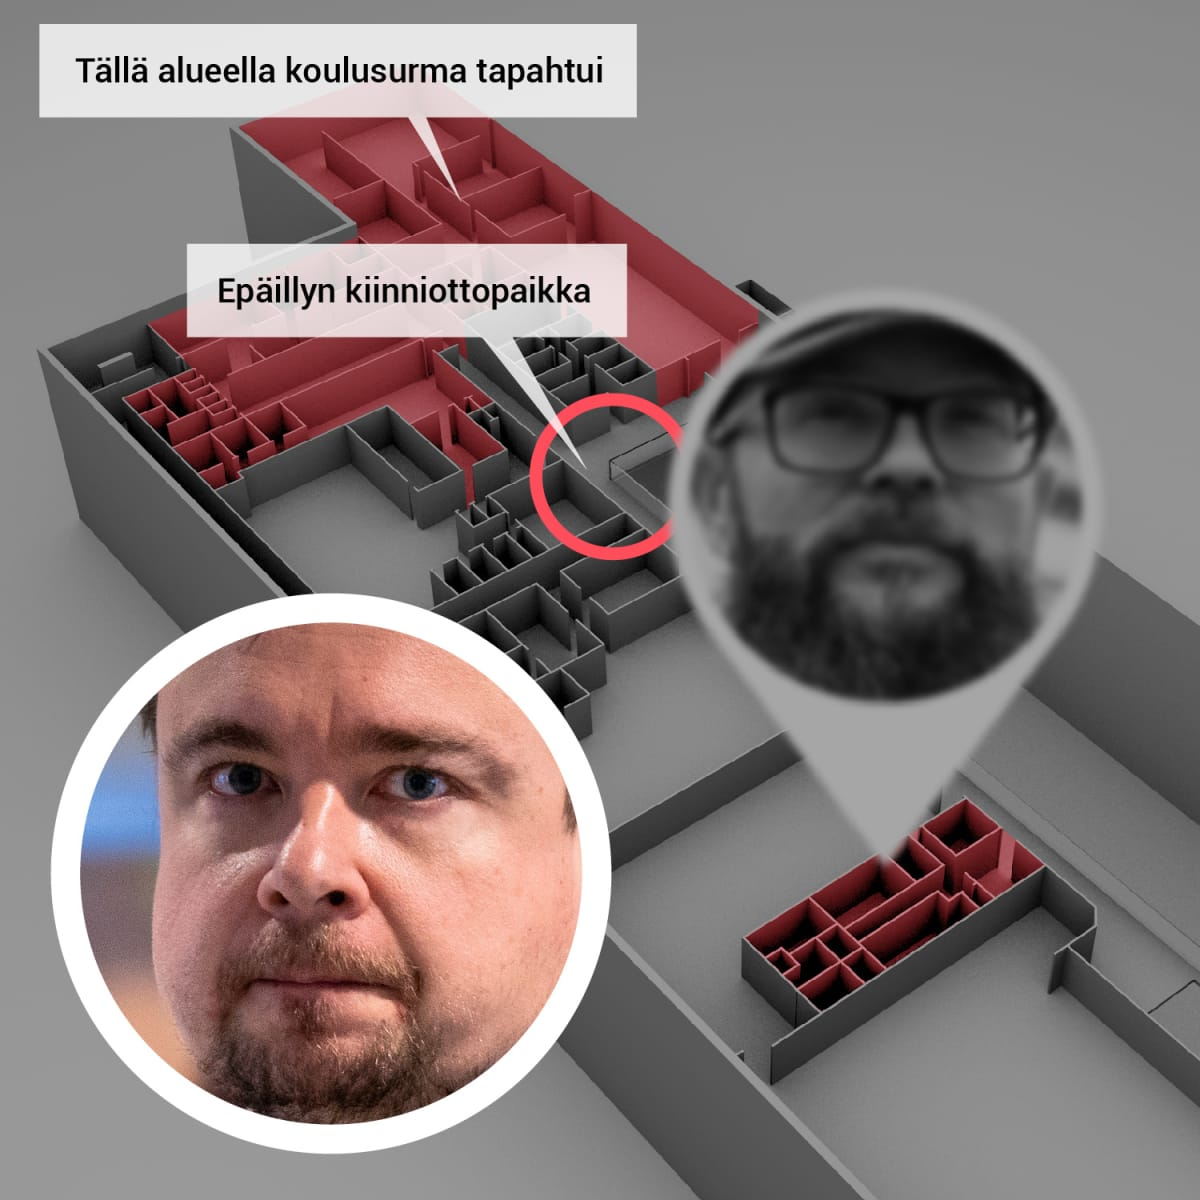 kuopio-pastori.jpg